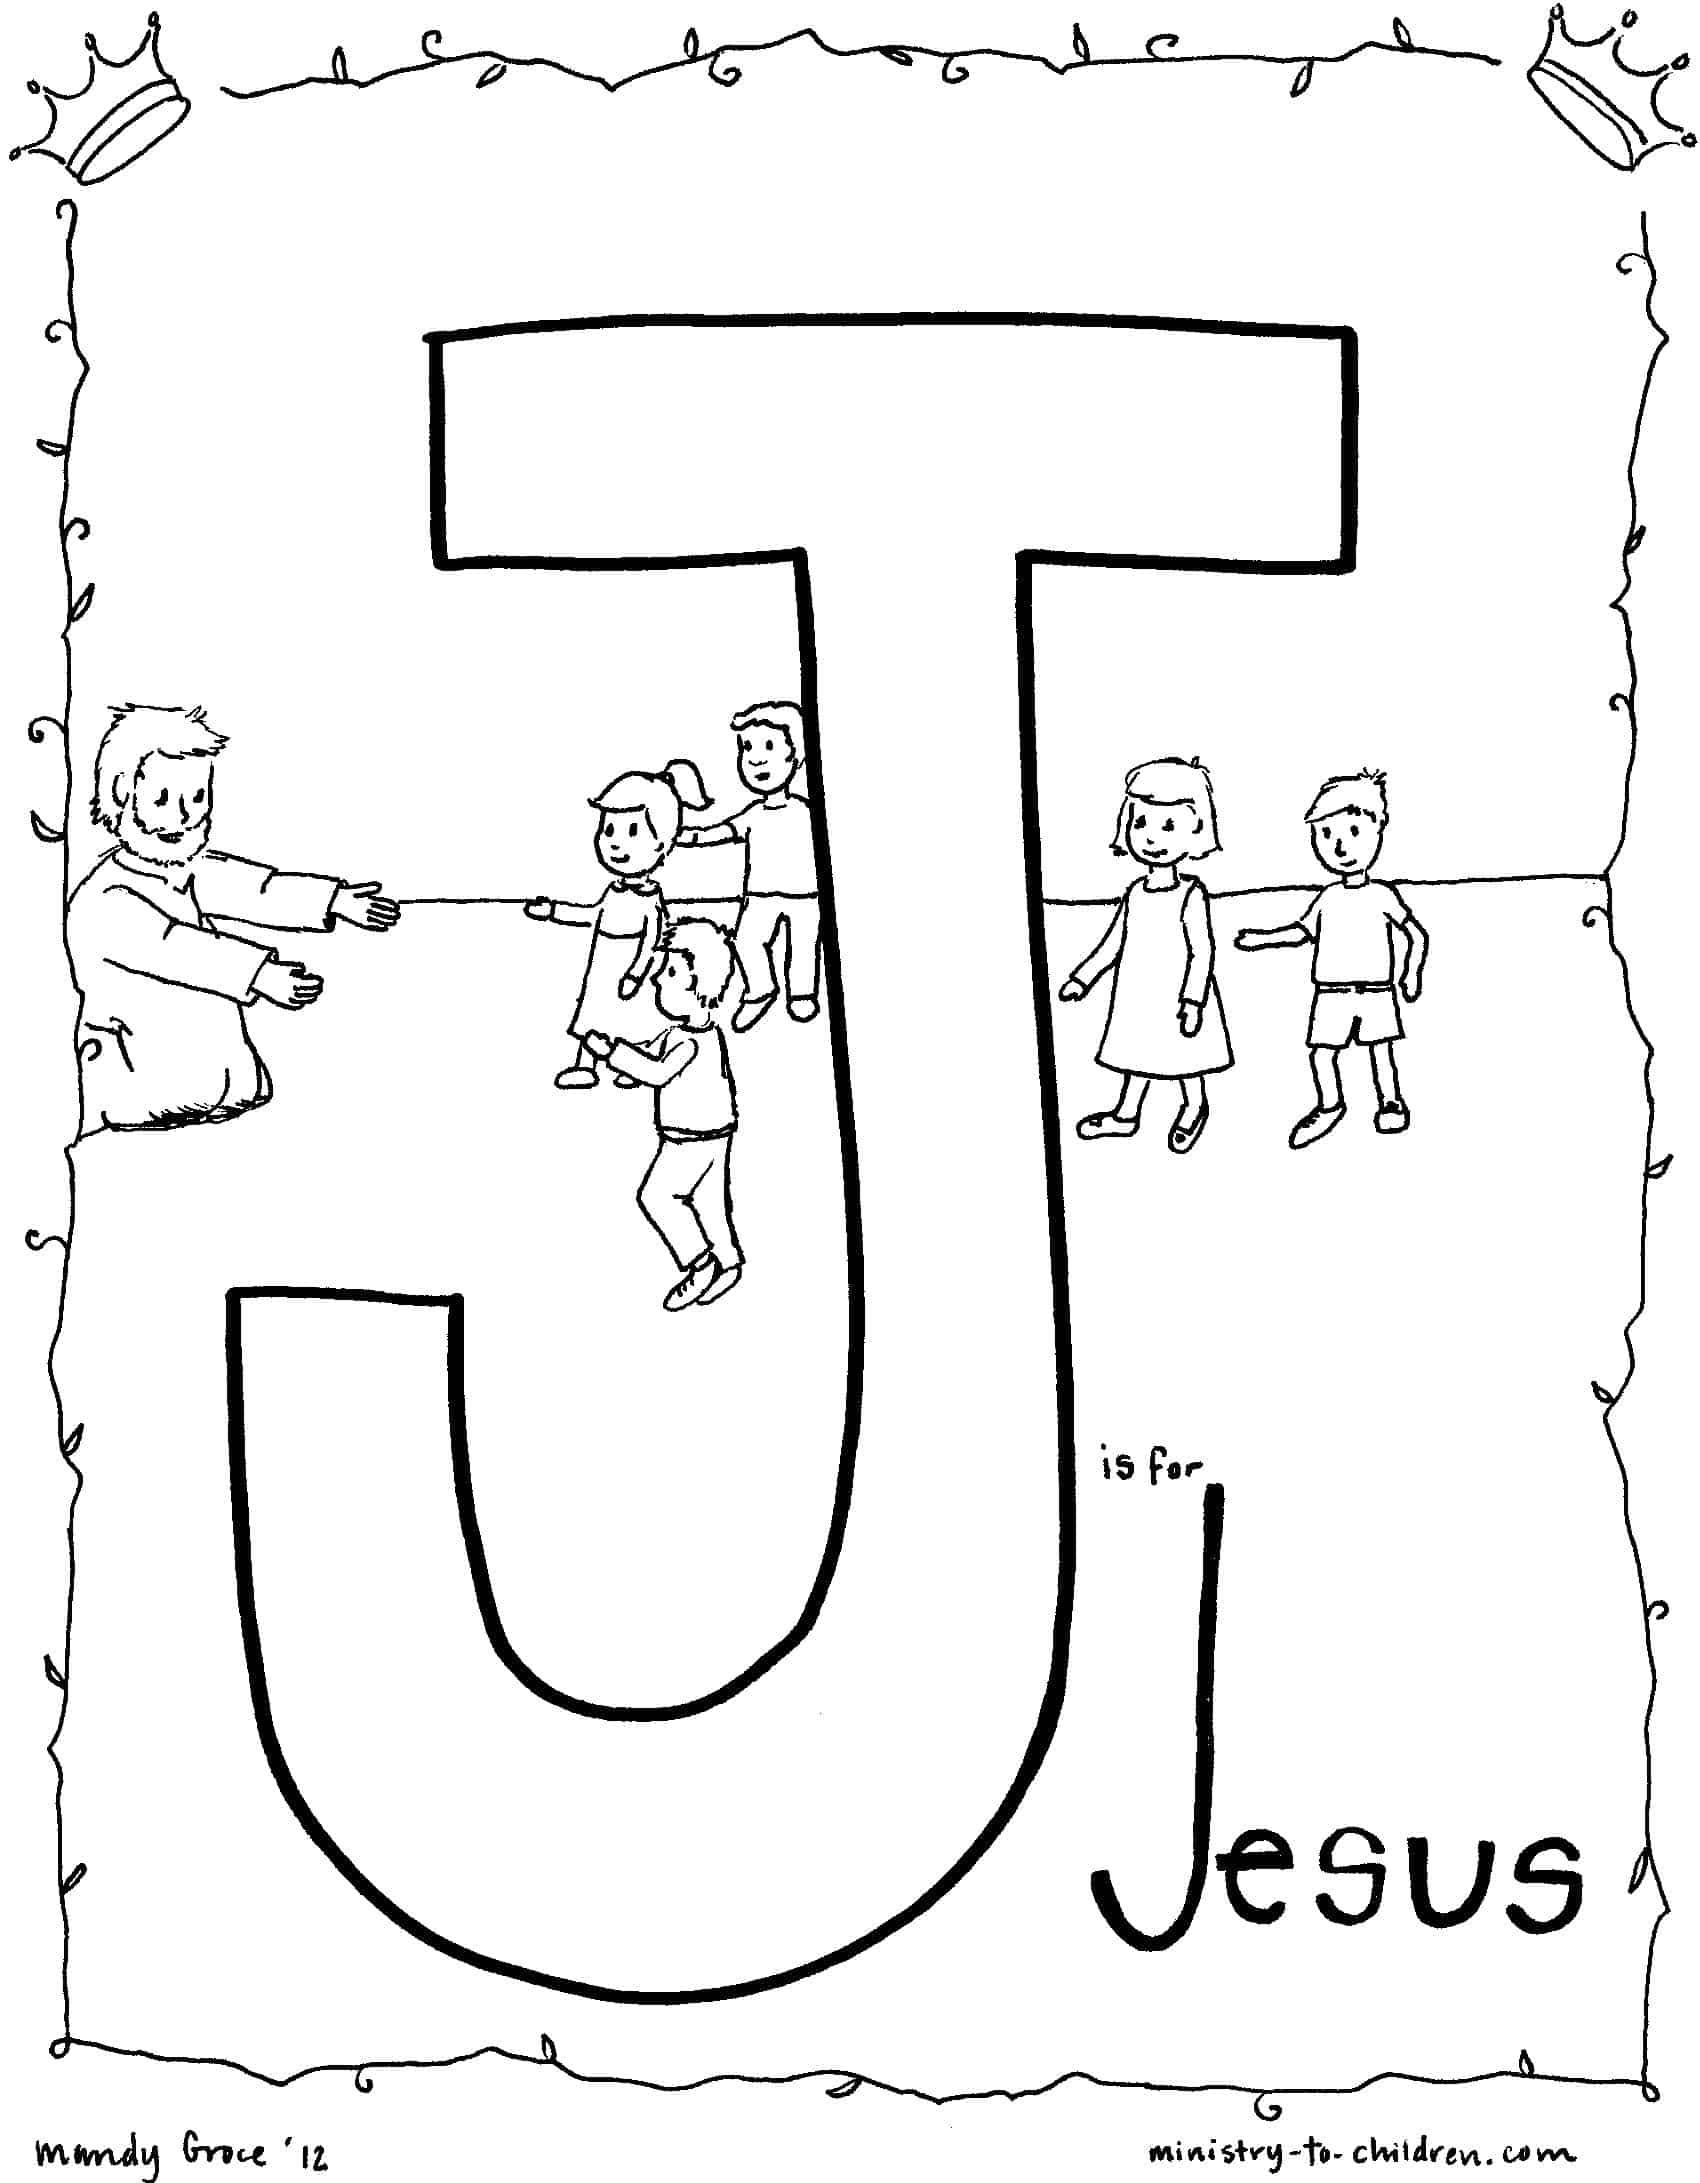 Sunday School Lesson (Luke 23:33-43) How Jesus' Cross